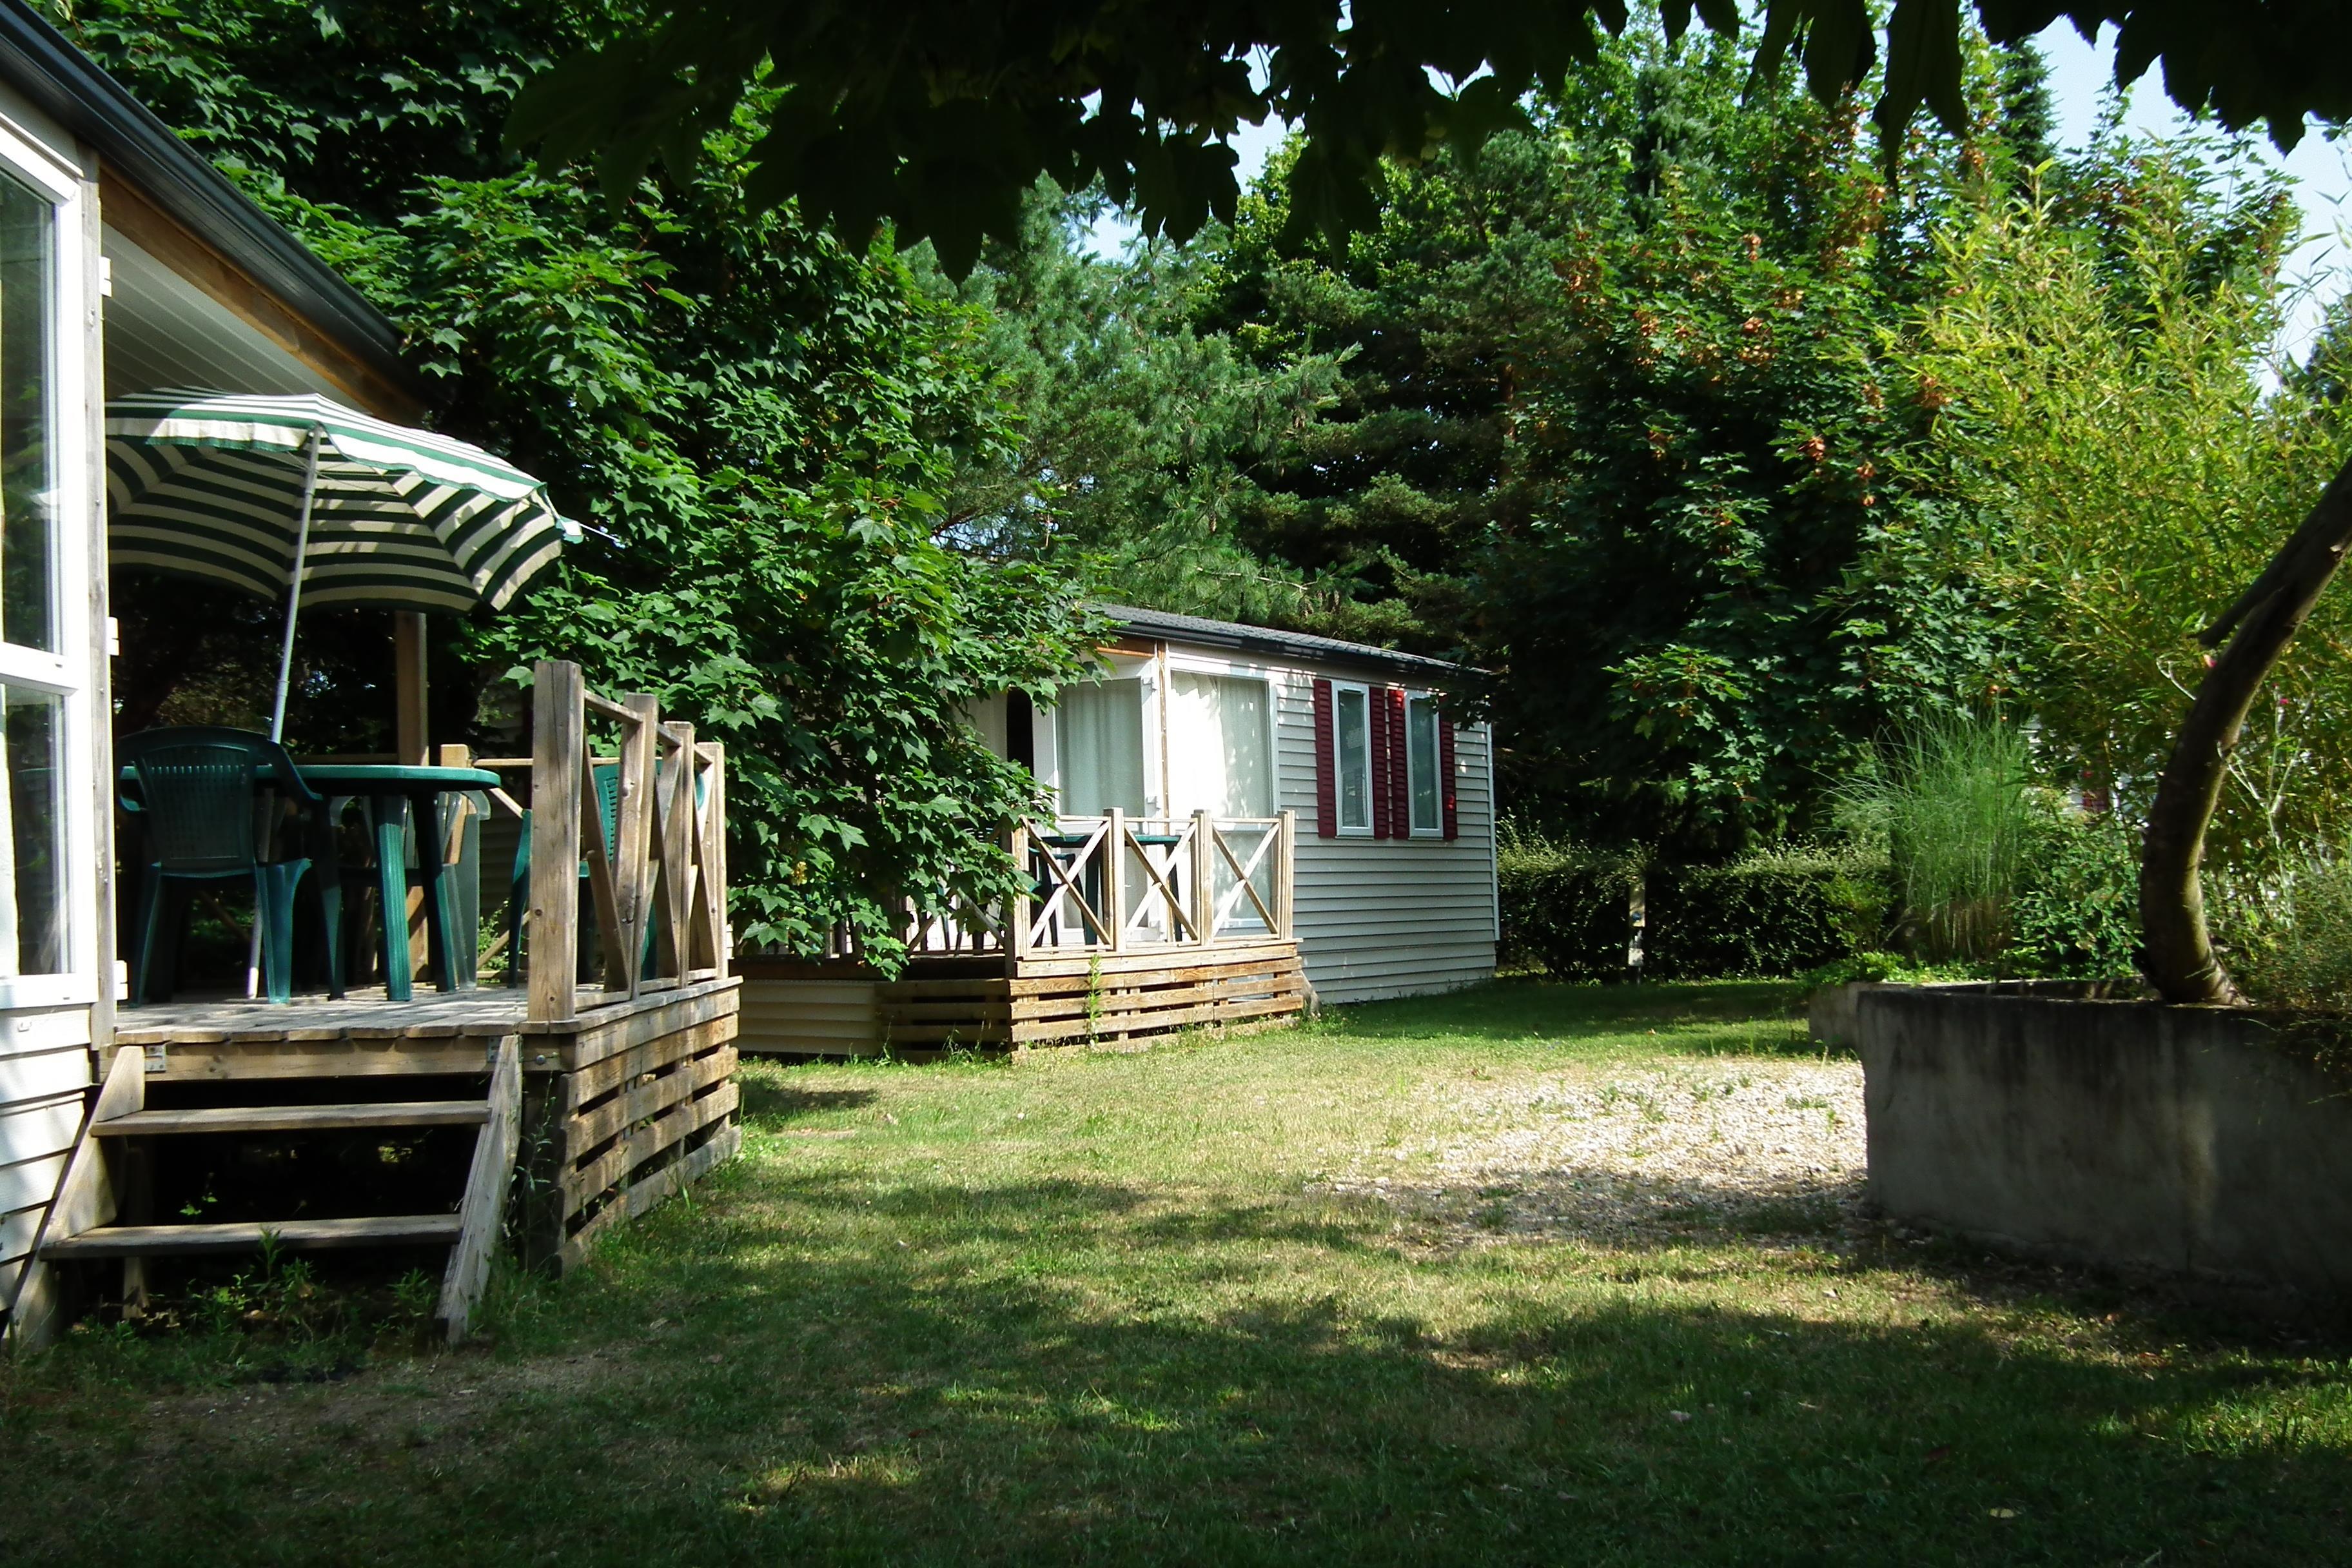 Location le jardin de sully location vacances for Camping jardin de mon pere